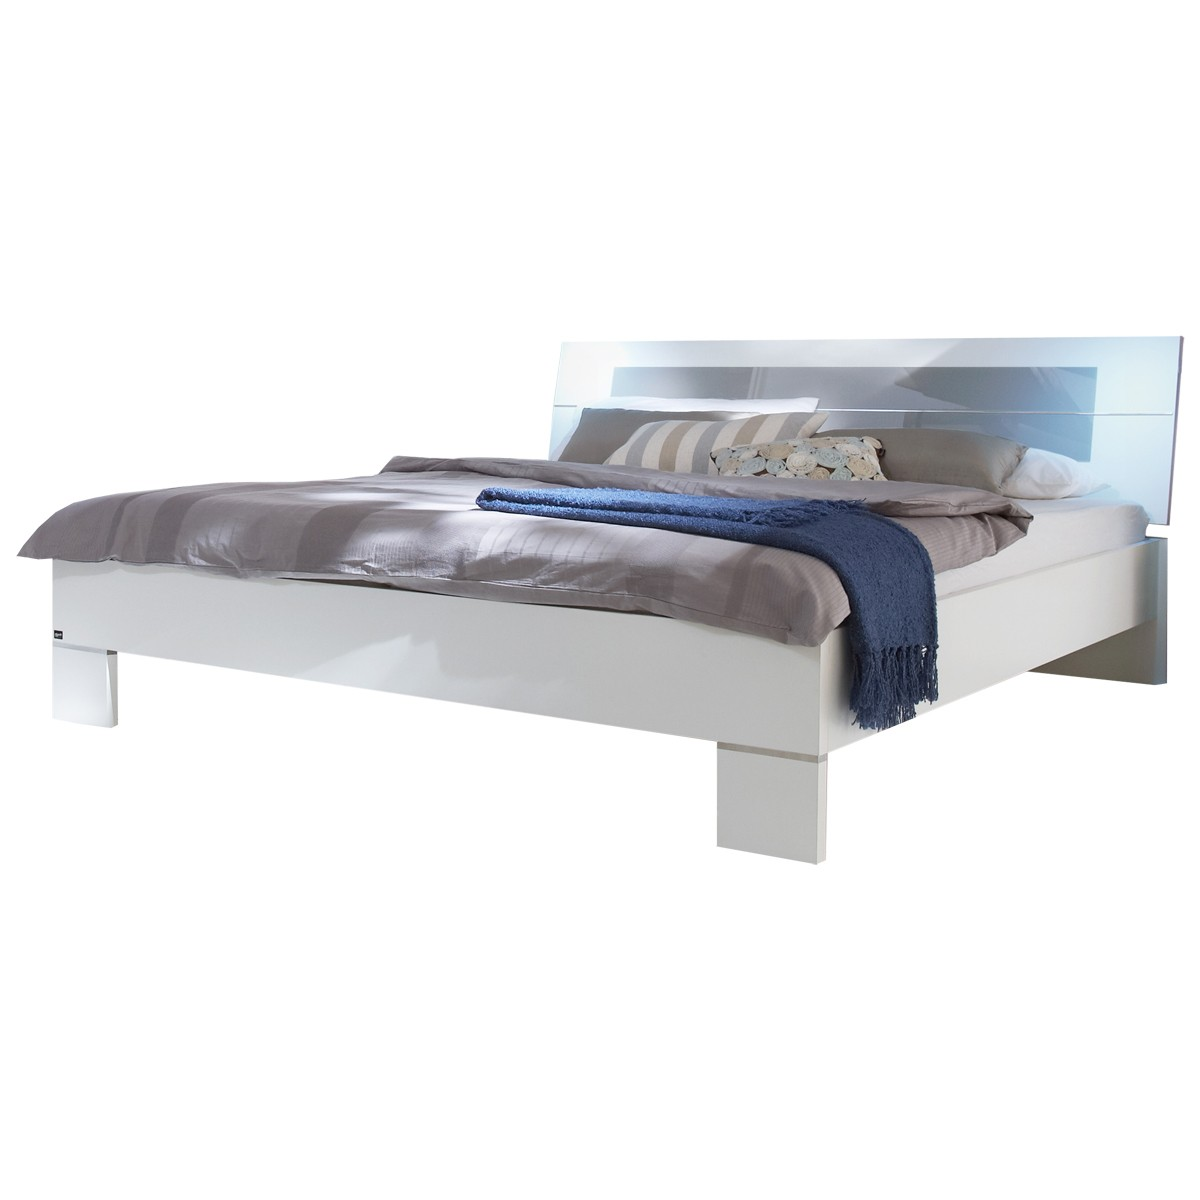 futonbett advantage 140 x 200 cm wei glas grau. Black Bedroom Furniture Sets. Home Design Ideas